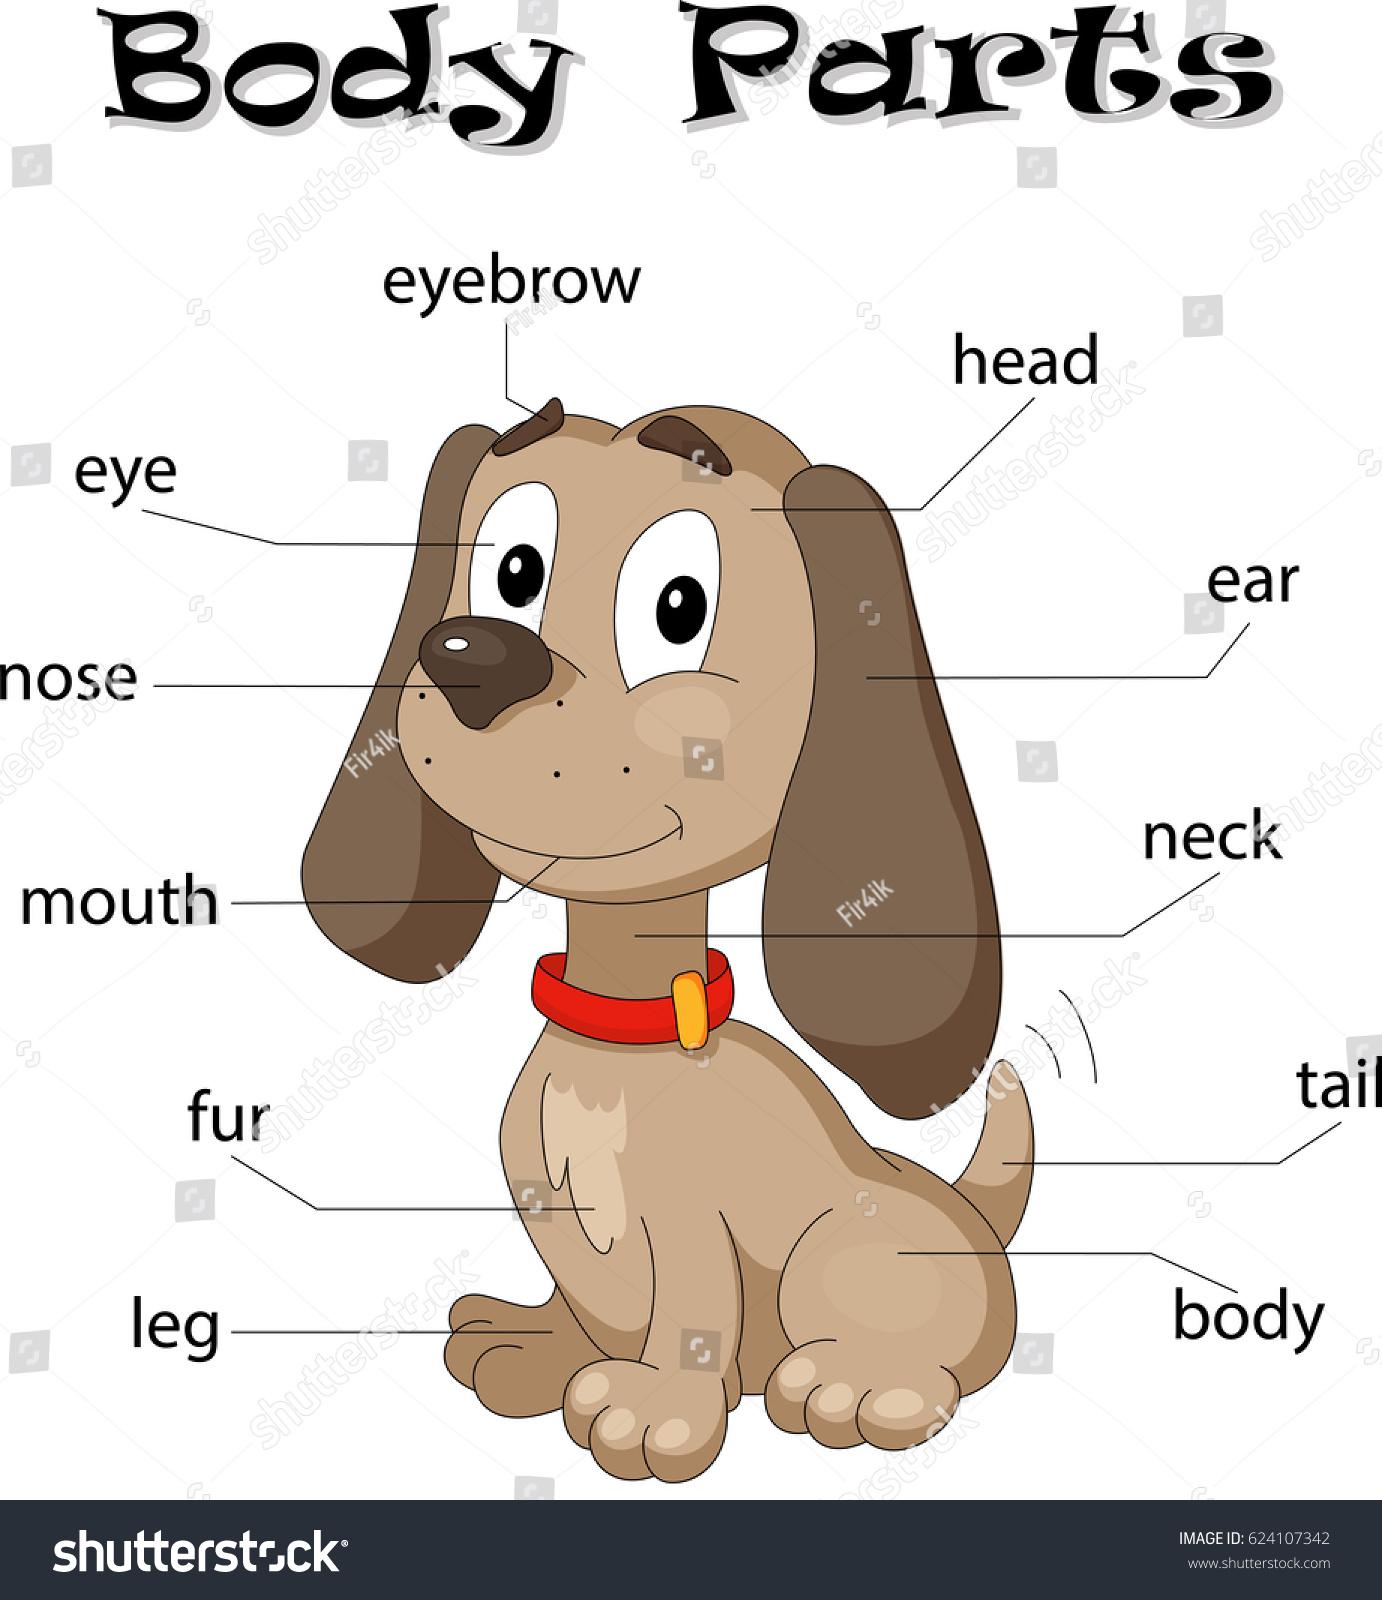 Dog Body Parts Animal Anatomy English Stock Illustration 624107342 ...